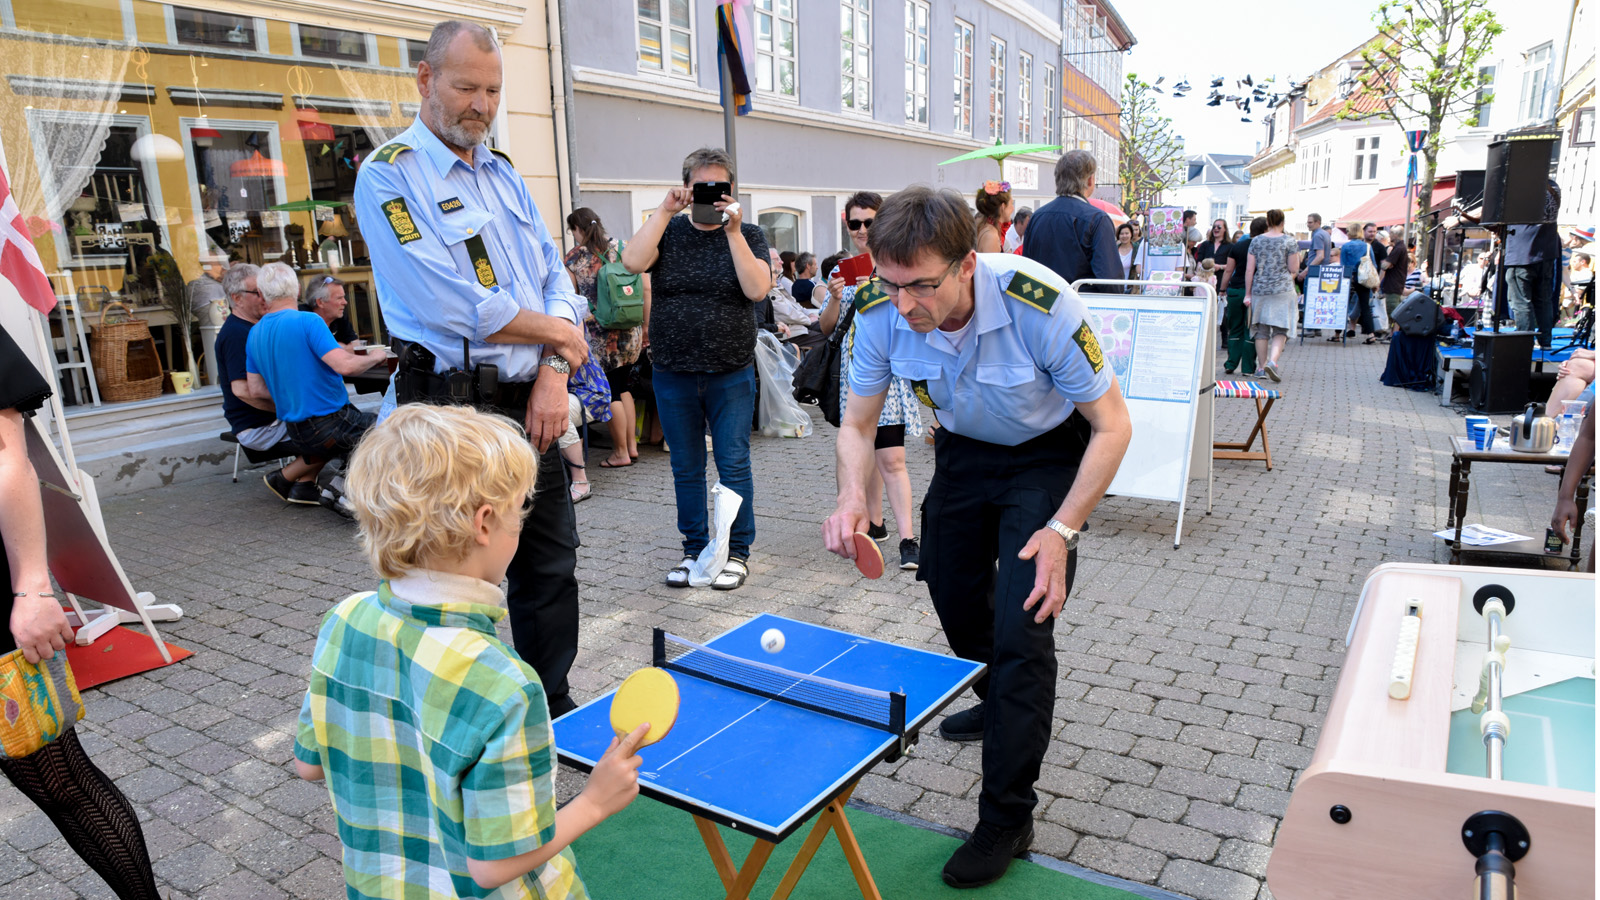 DSC_5889 - Gadefest betjent spiller bordtennis